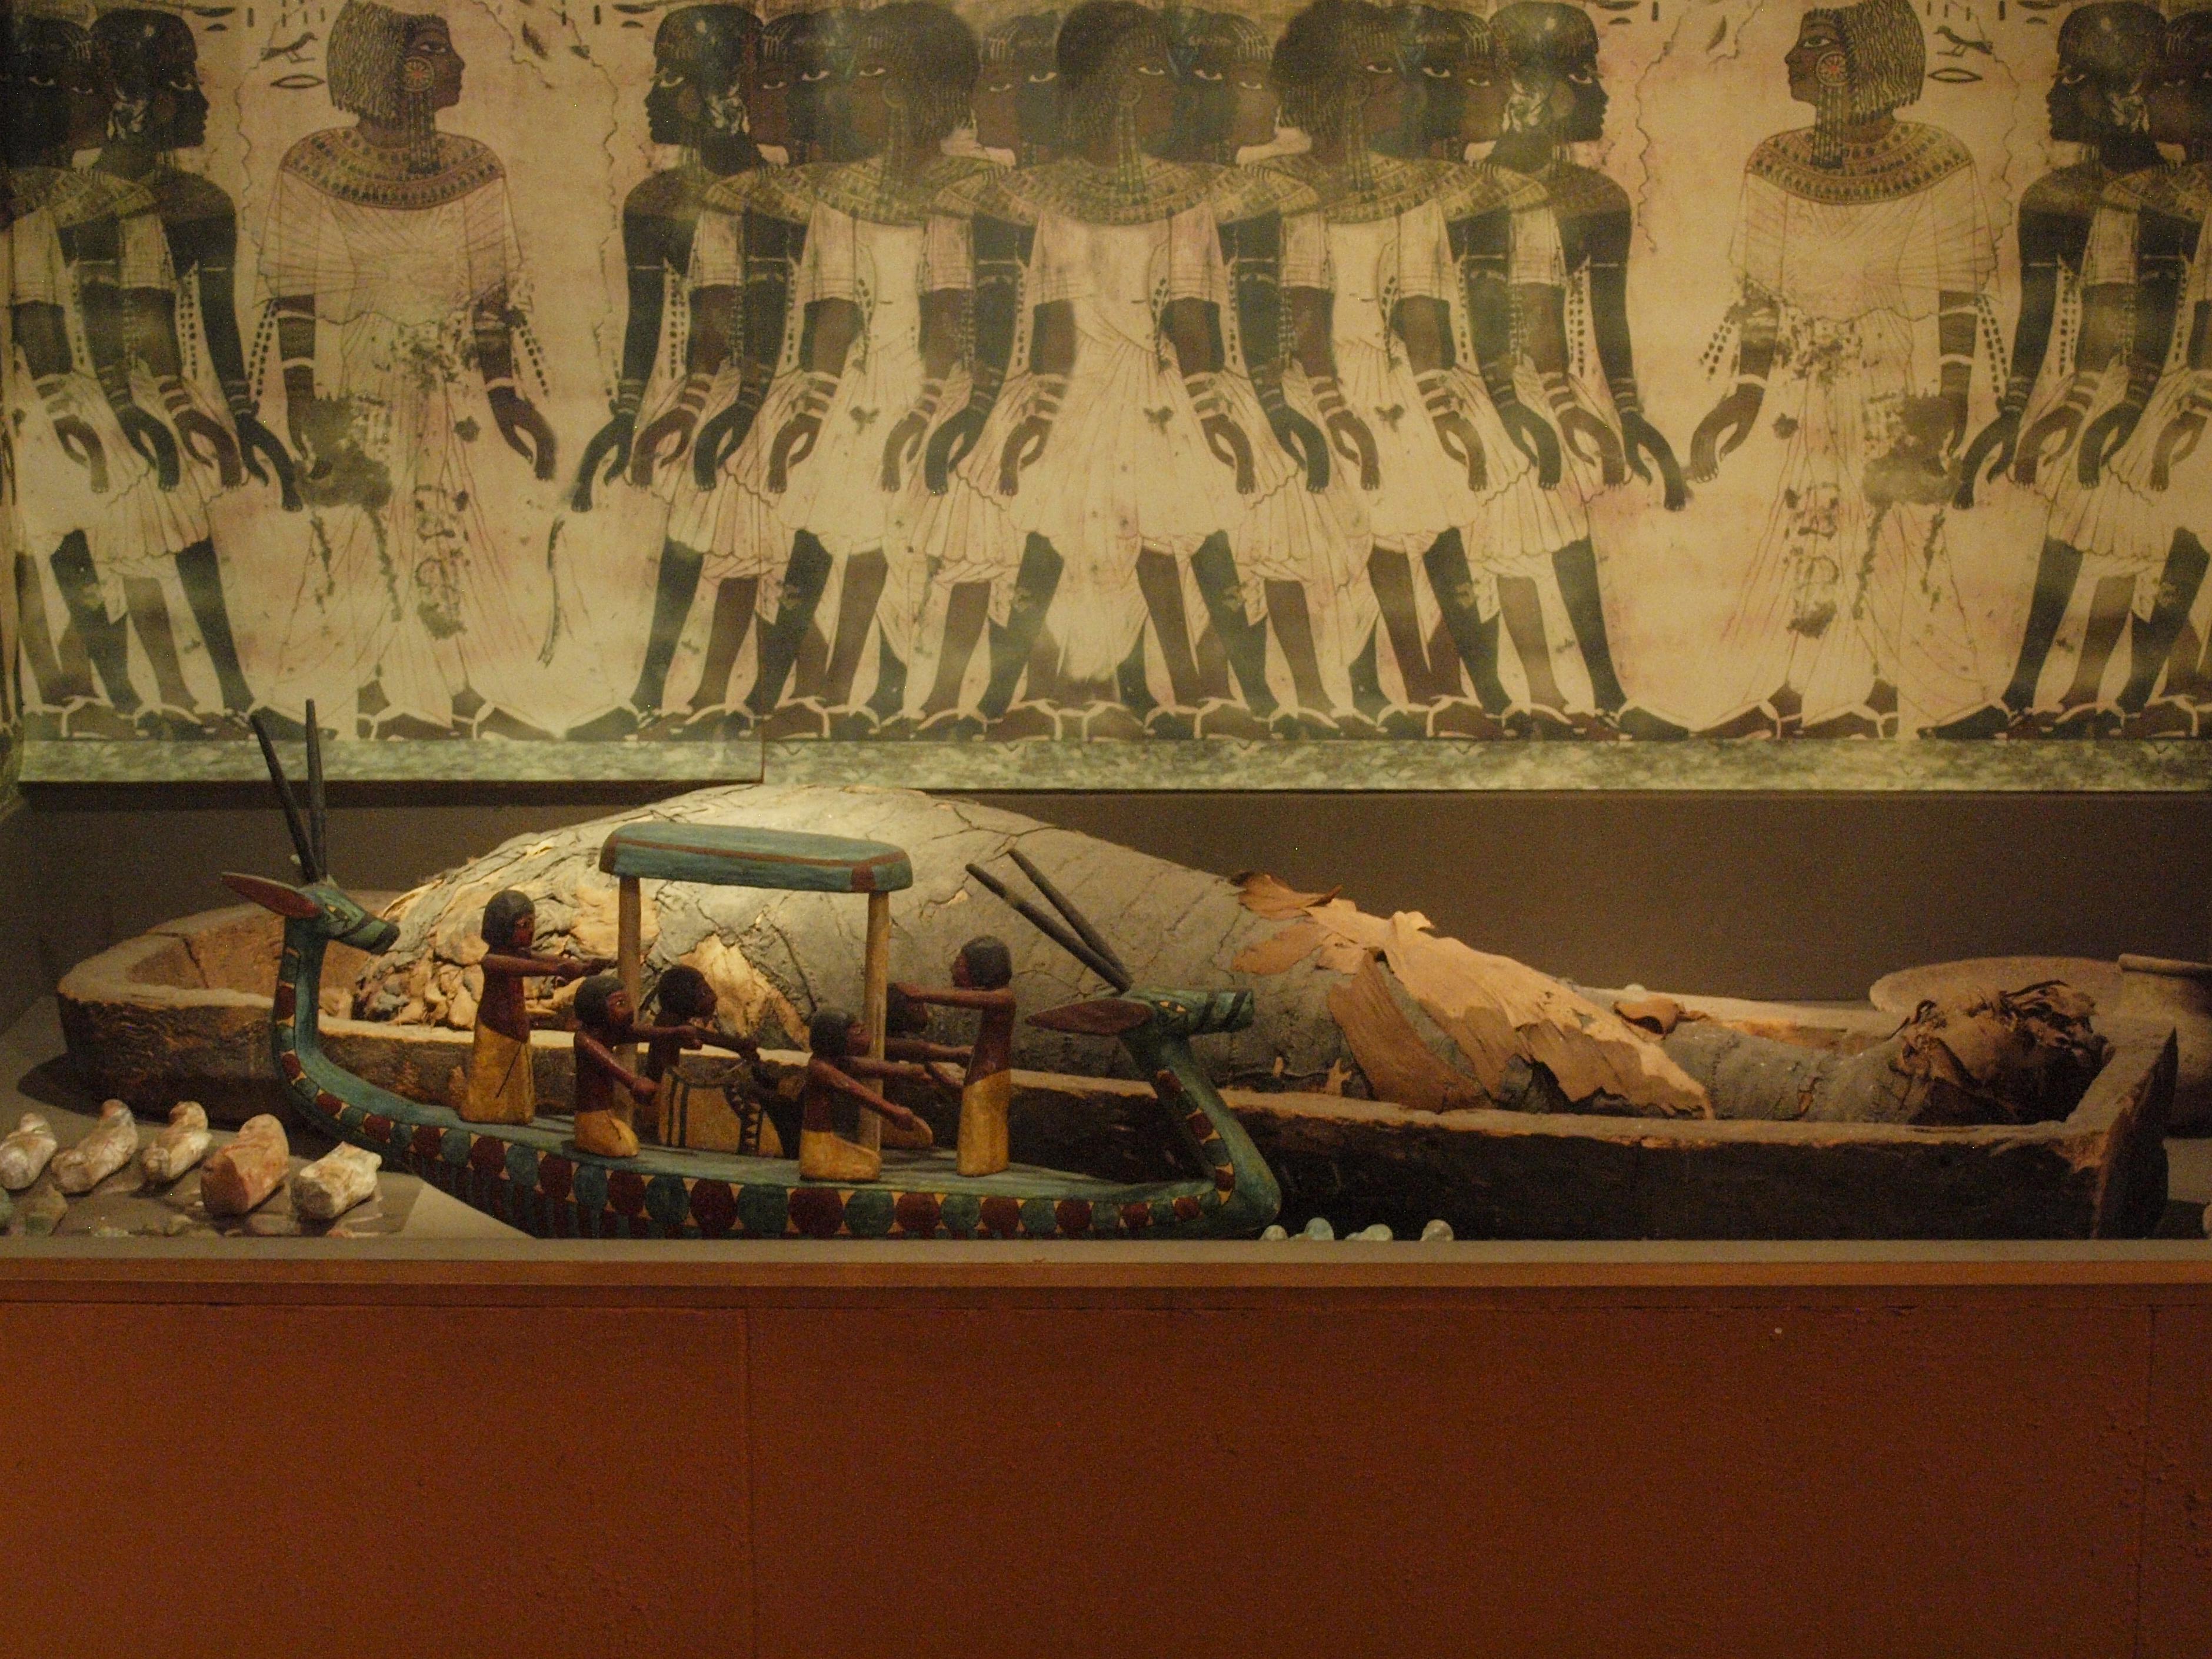 File:April 26, 2012 - San Diego Museum of Man - Headless Mummy ...